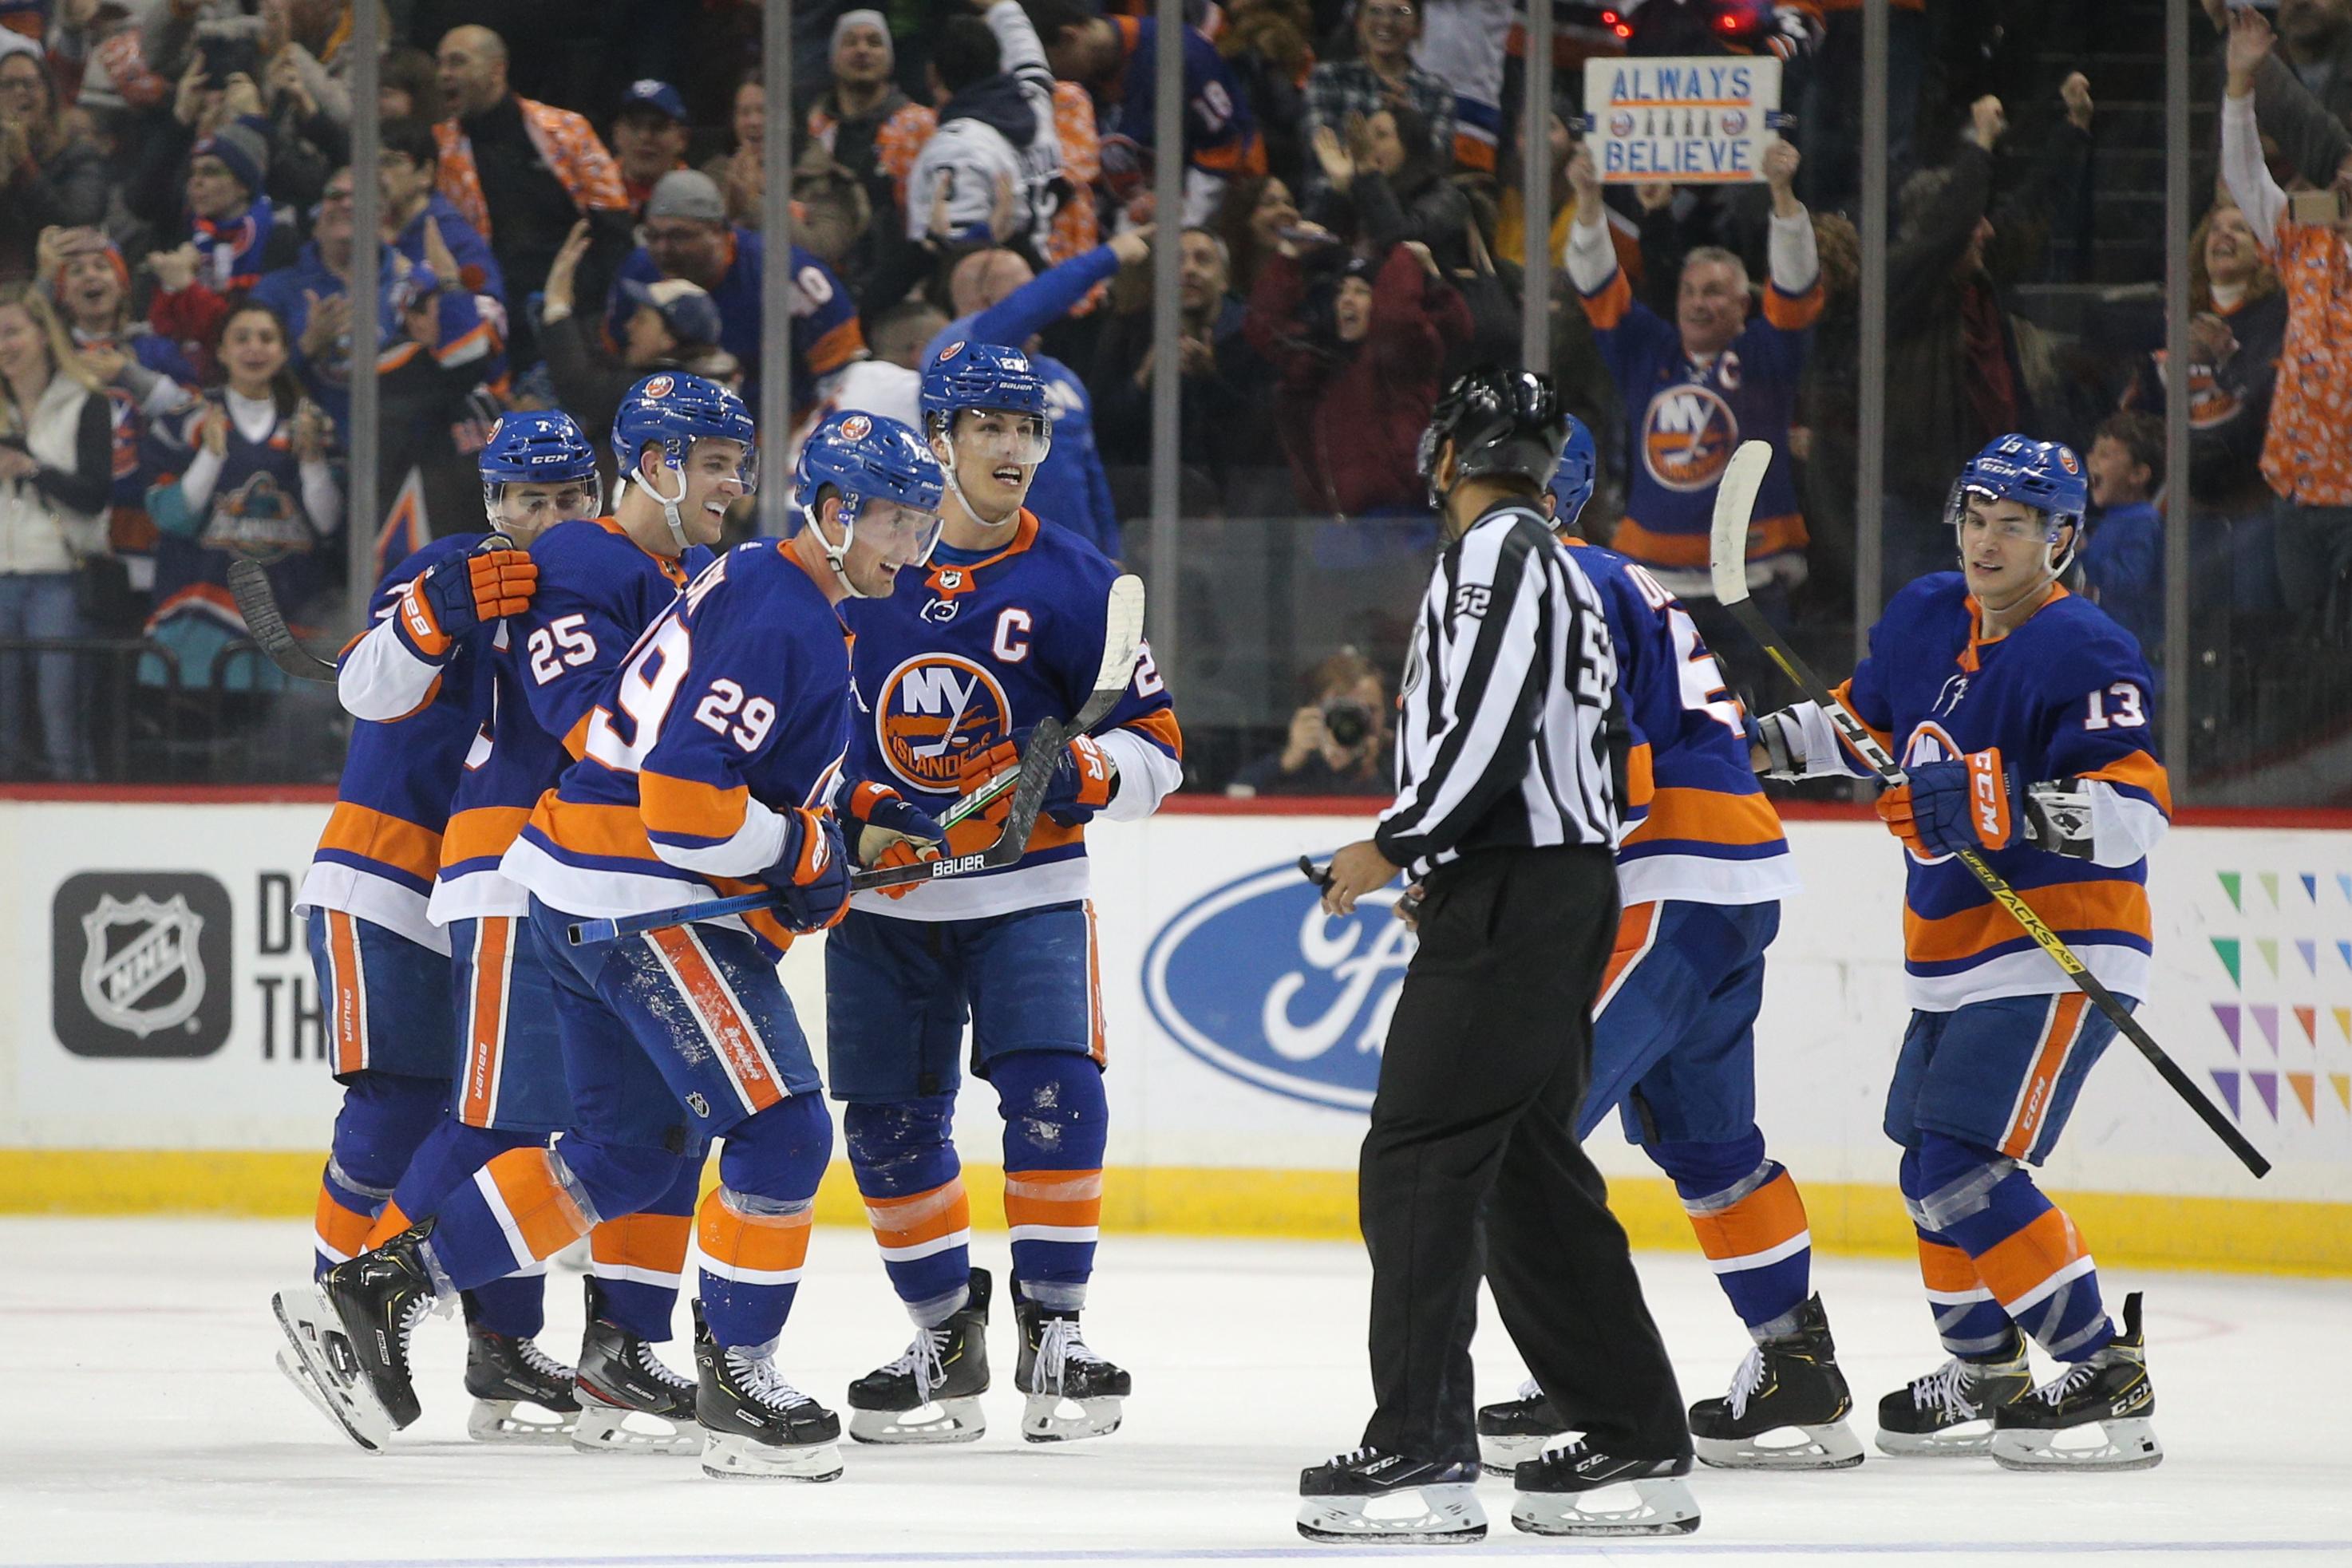 Islanders start second half of season knowing it's crunch time